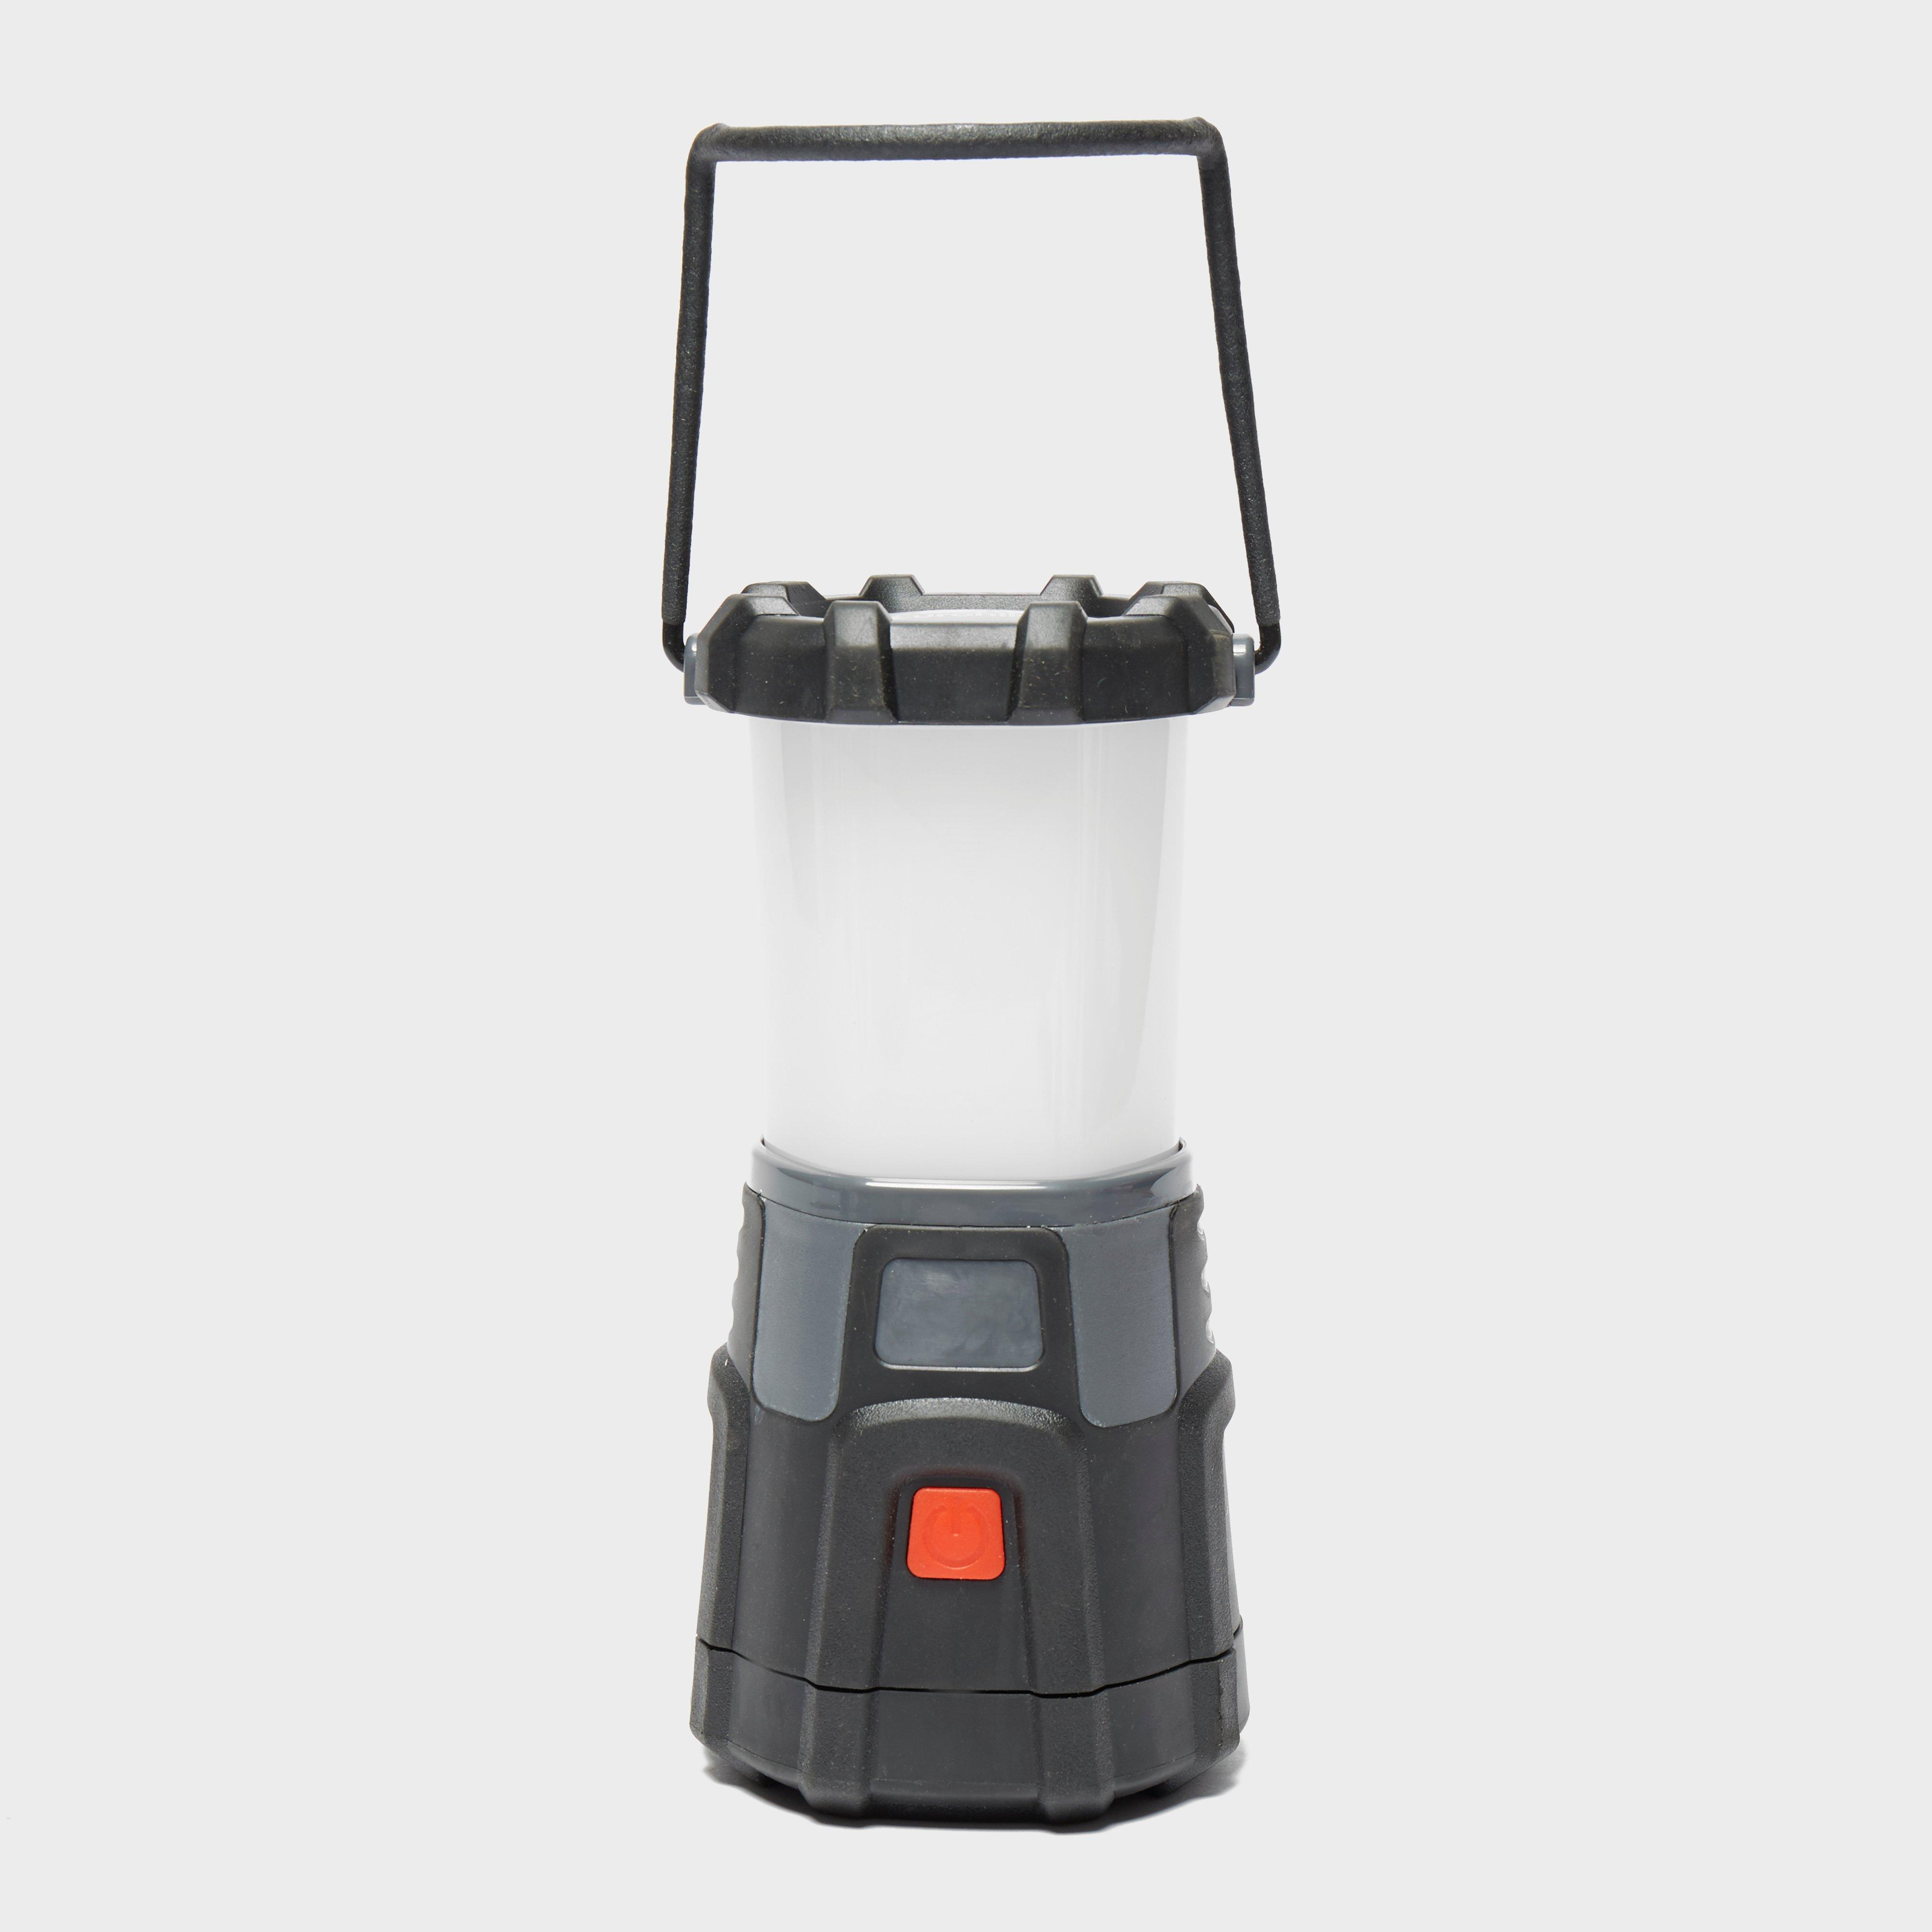 Eurohike Eurohike 1000L Cob Power Lantern - Grey, Grey